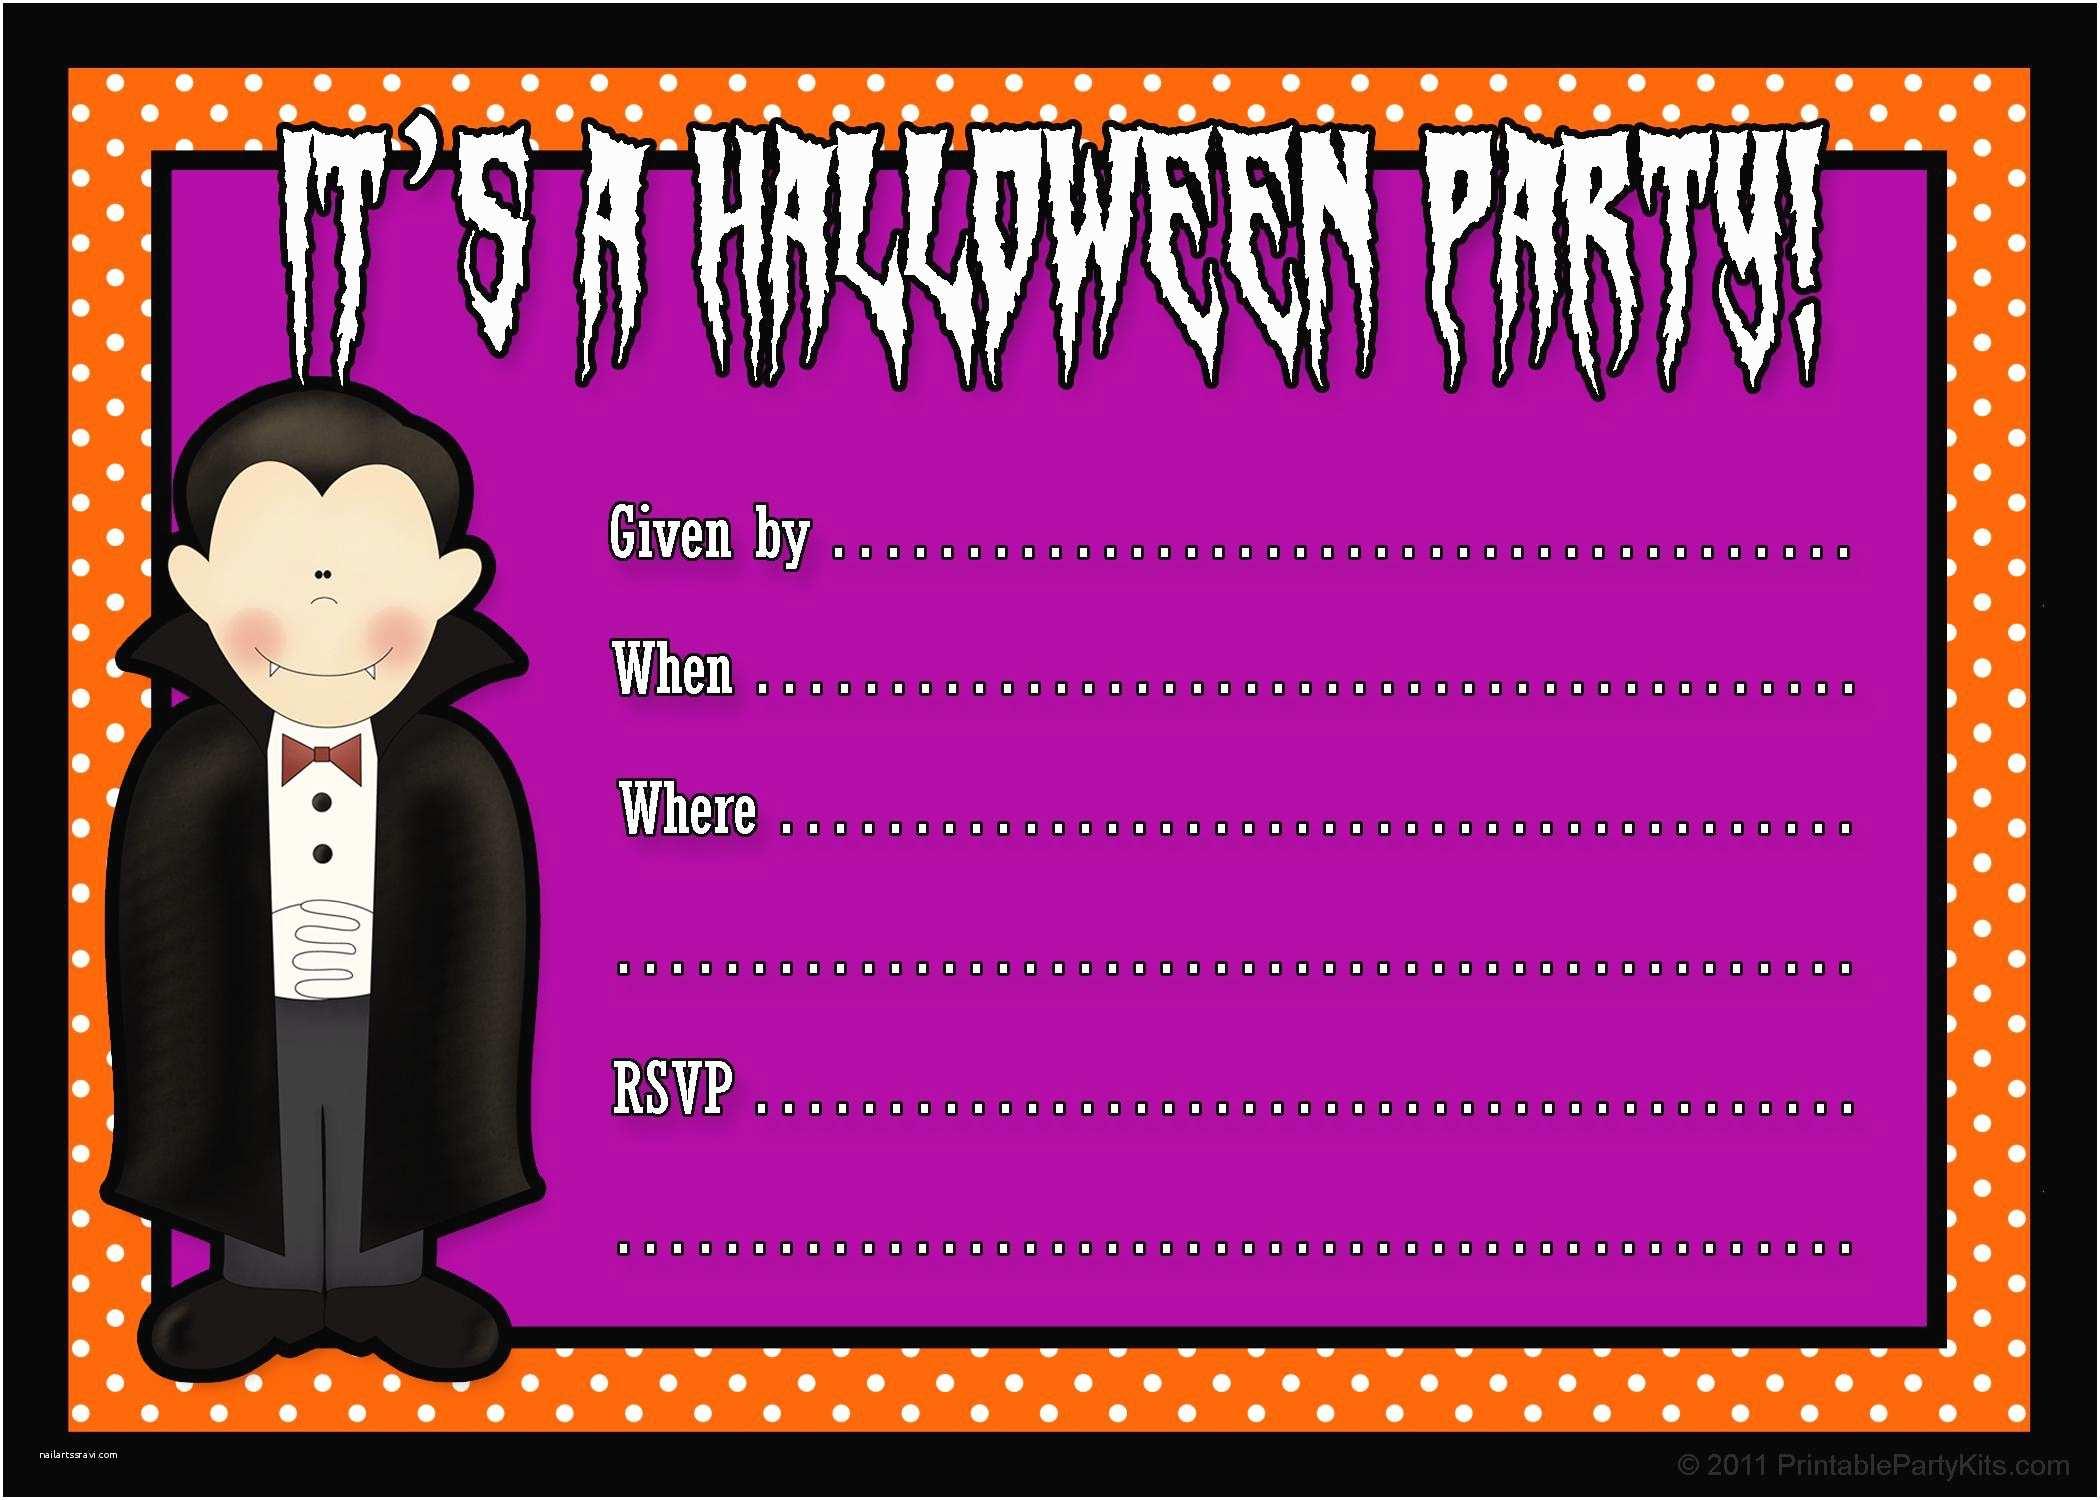 Costume Party Invitation Wording Halloween Party Invitation Wording